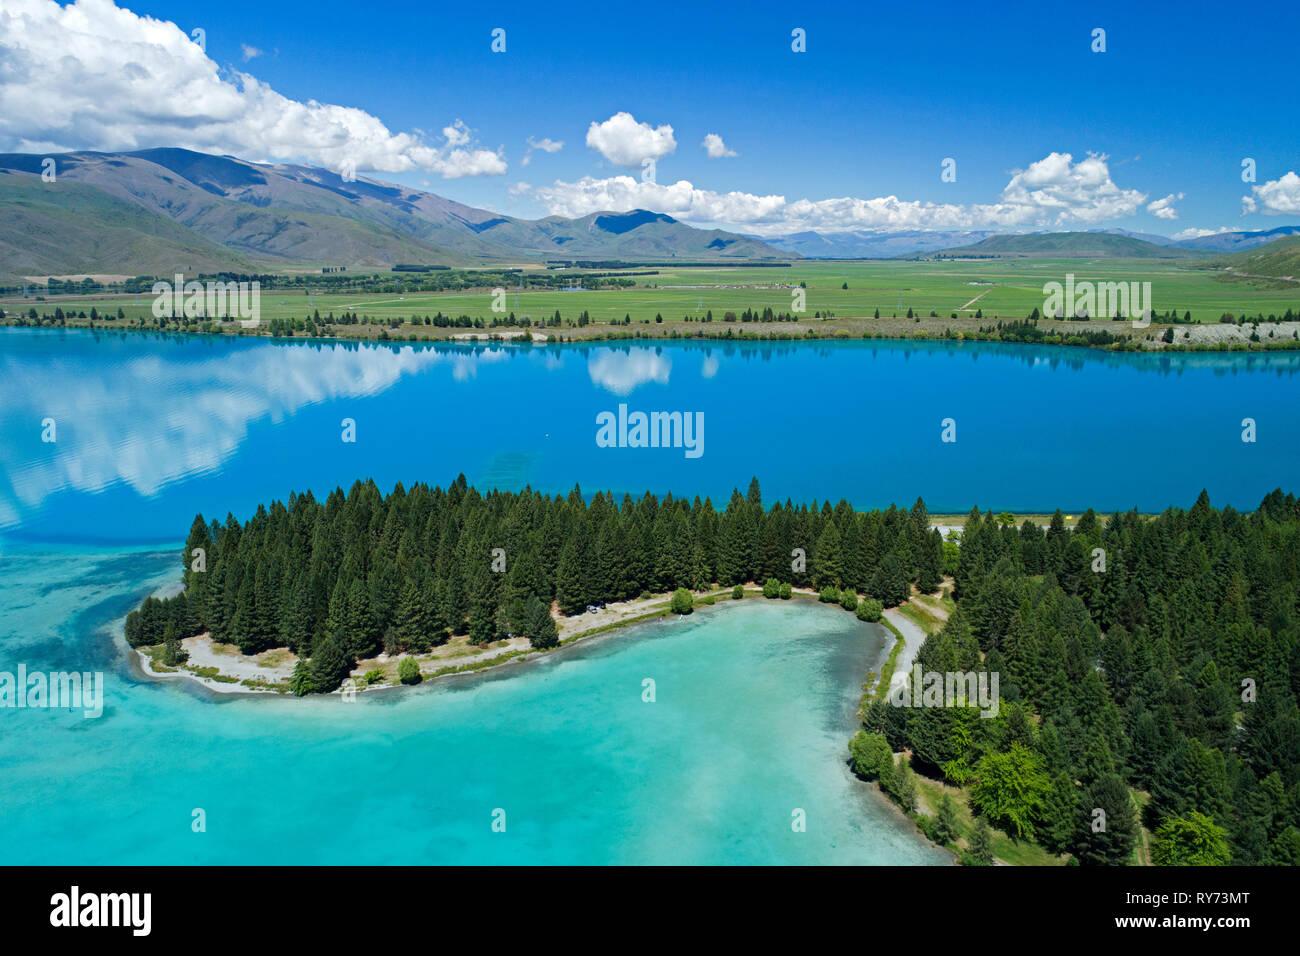 Lake Ruataniwha and Benmore Range, Mackenzie Country, South Island, New Zealand - aerial - Stock Image